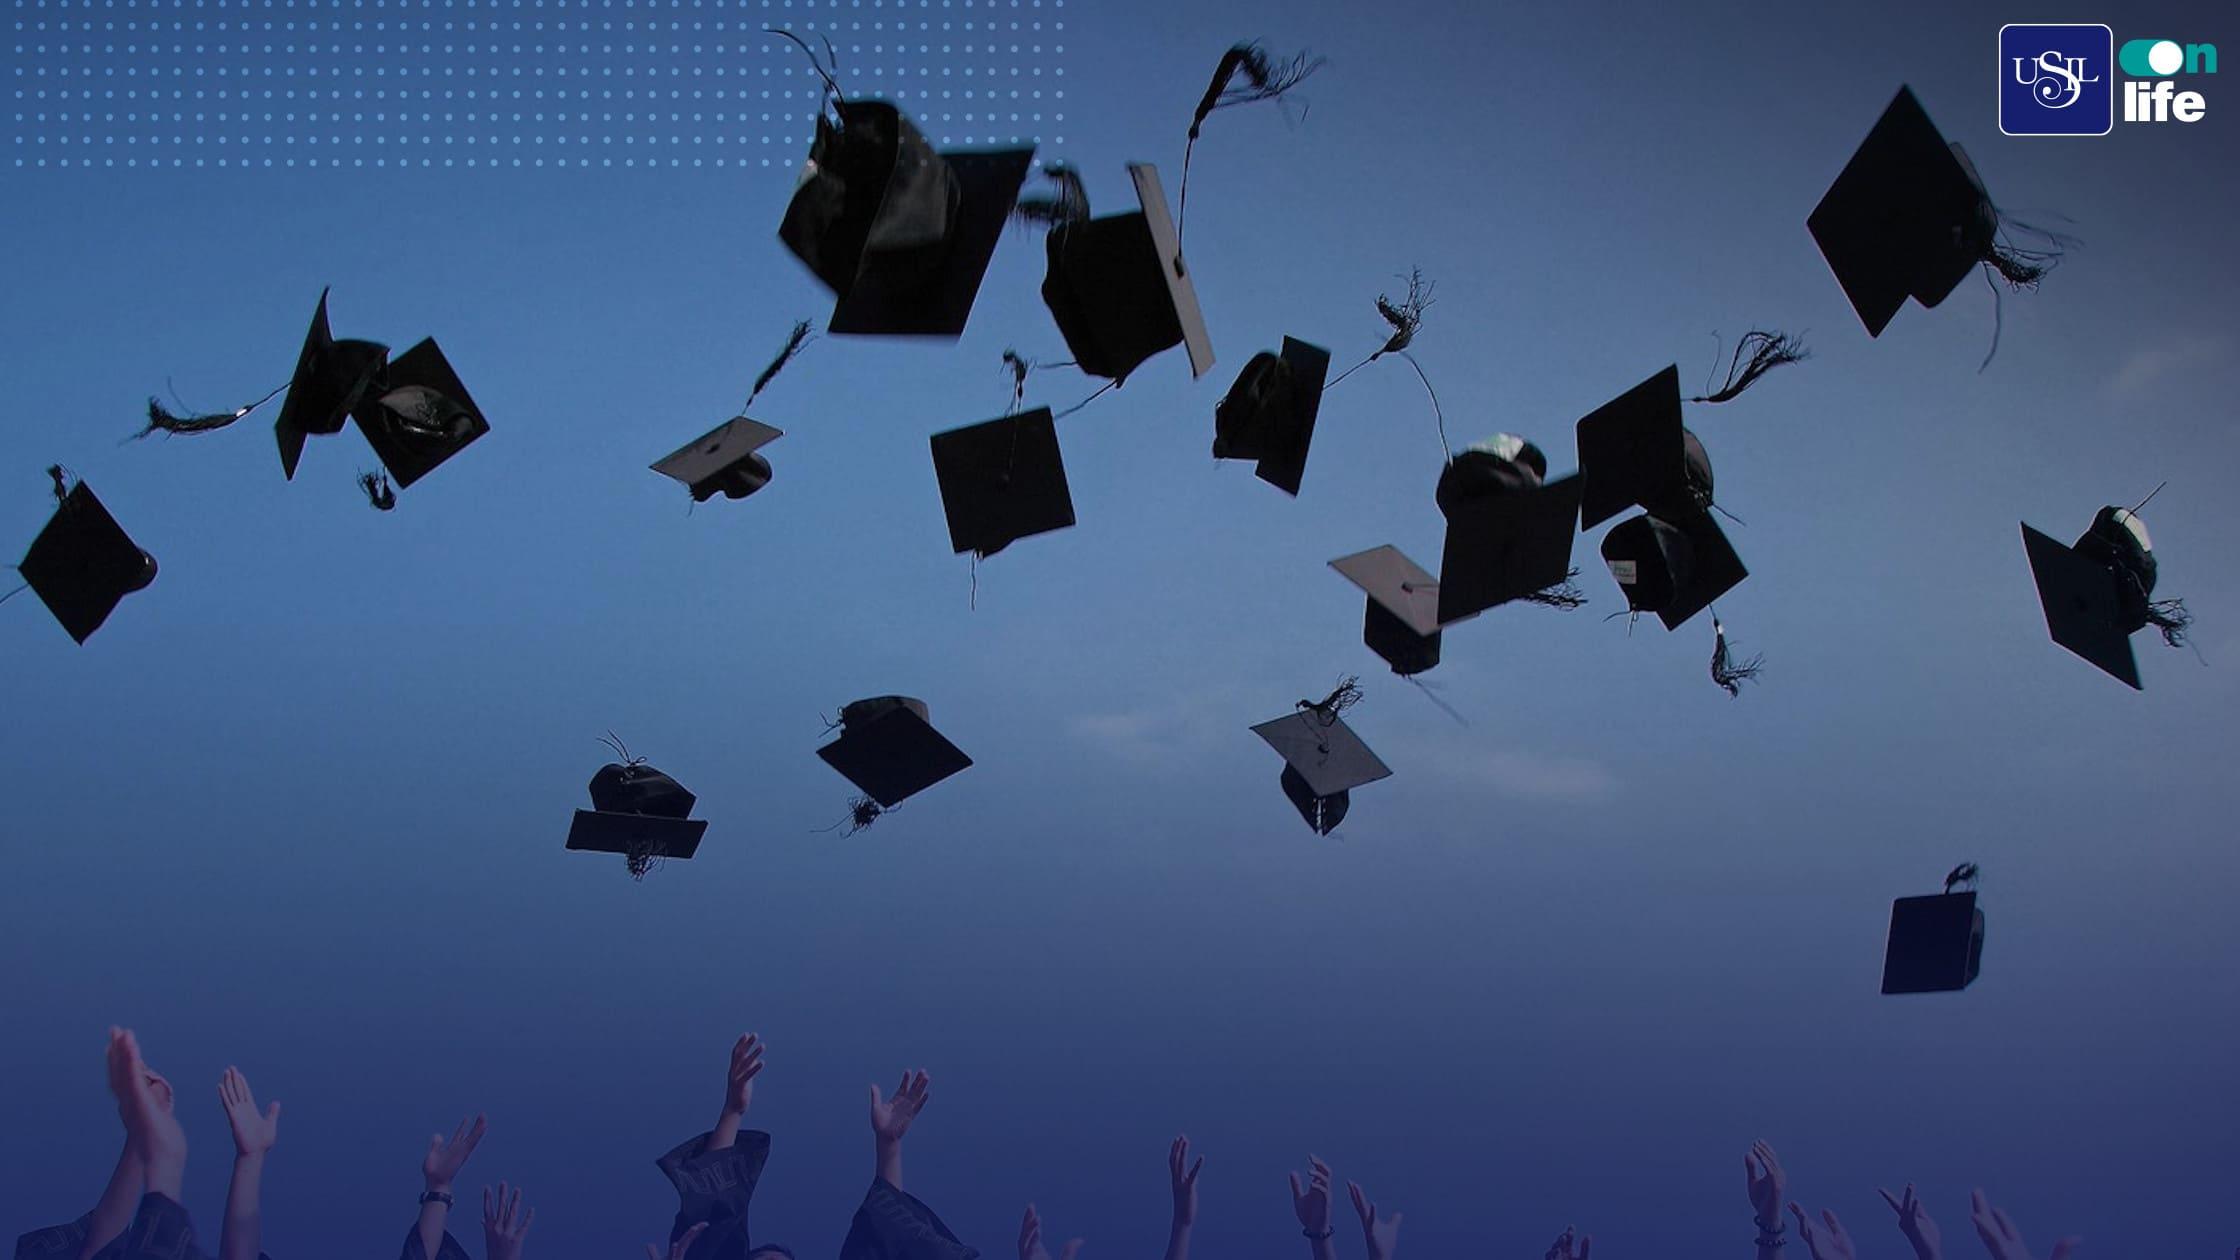 usil-entre-las-mejores-universidades